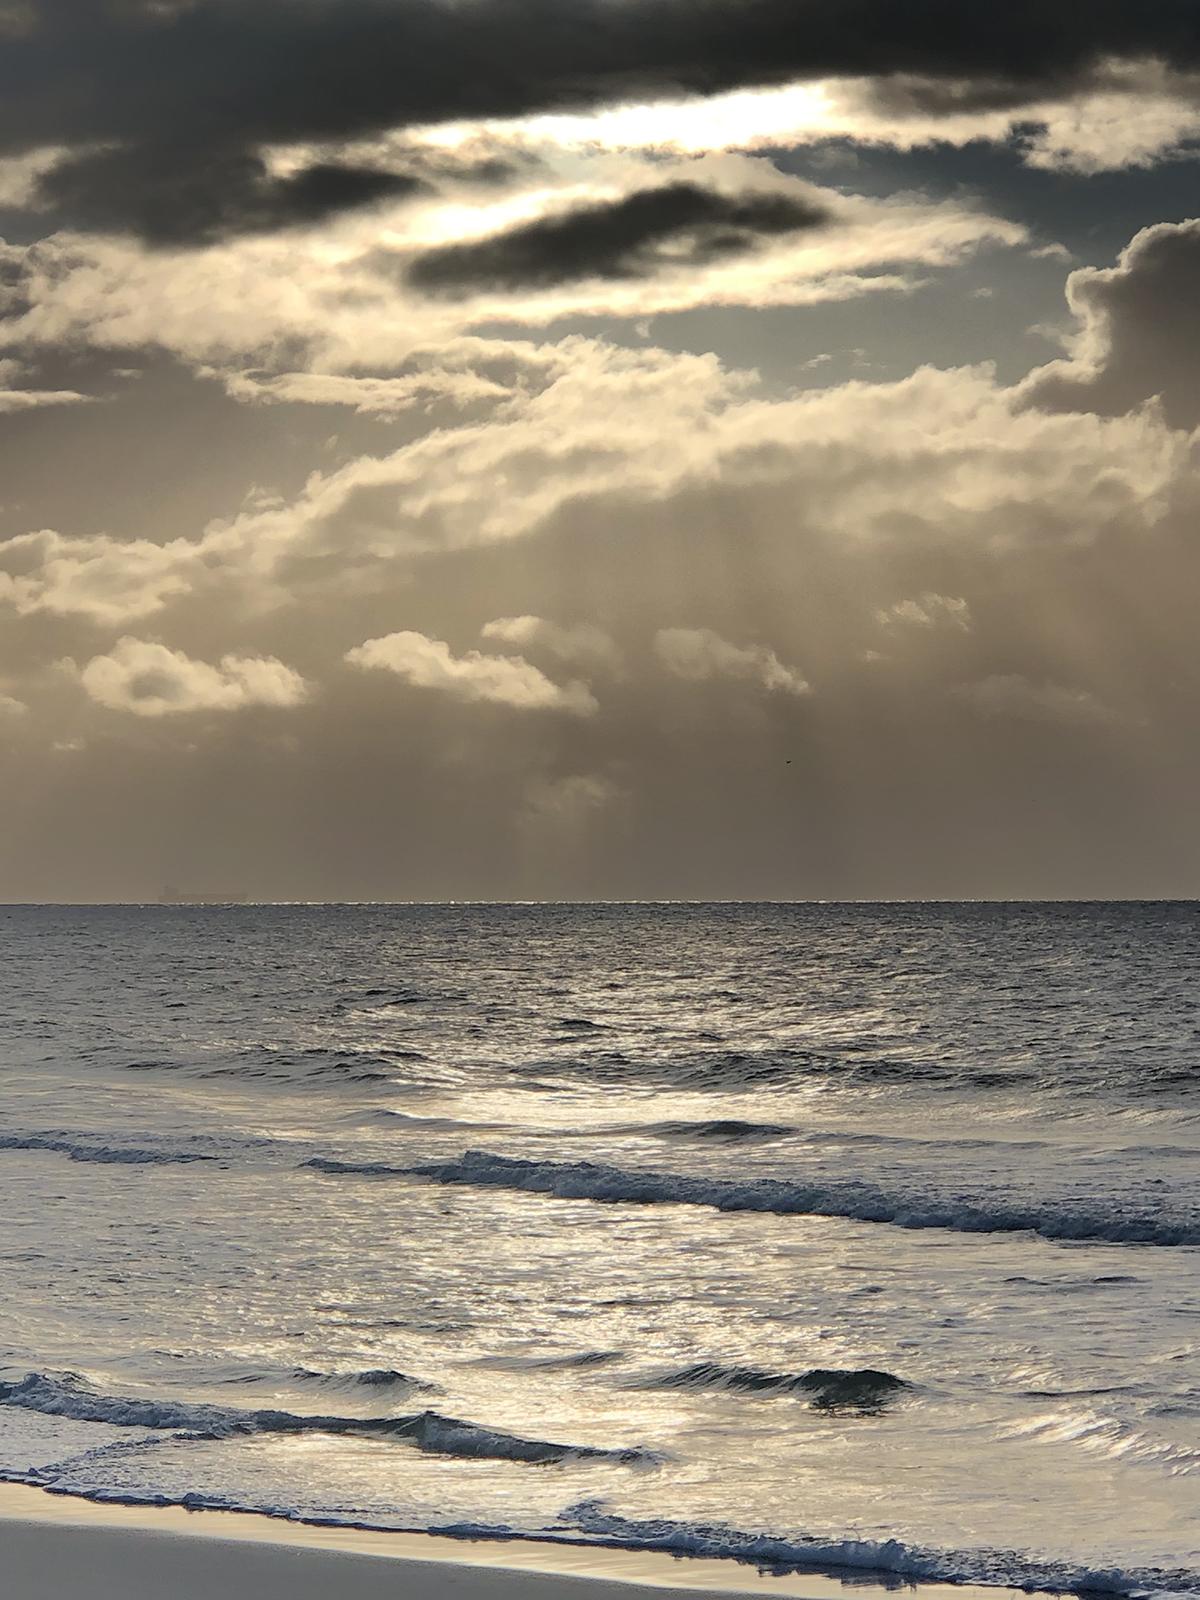 Dan Scott, Sunrise, Bribie Island, 2021, Reference Photo